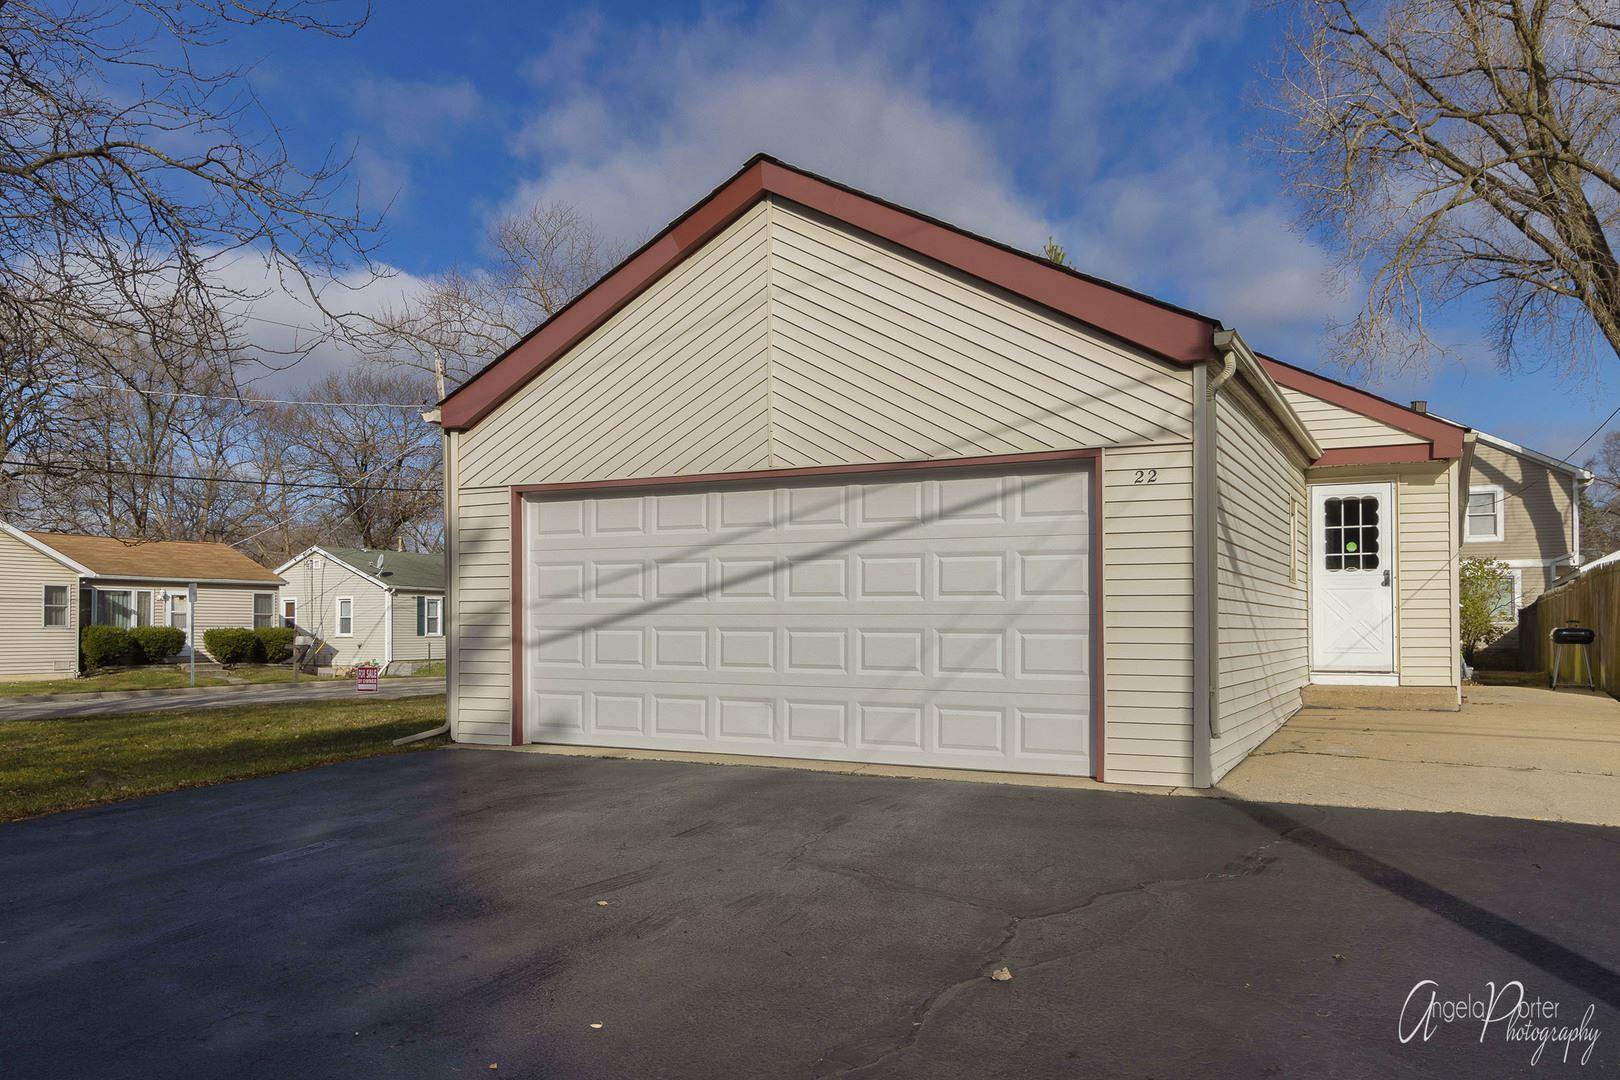 22 Cross Street, Fox Lake, IL 60020 - #: 10932817